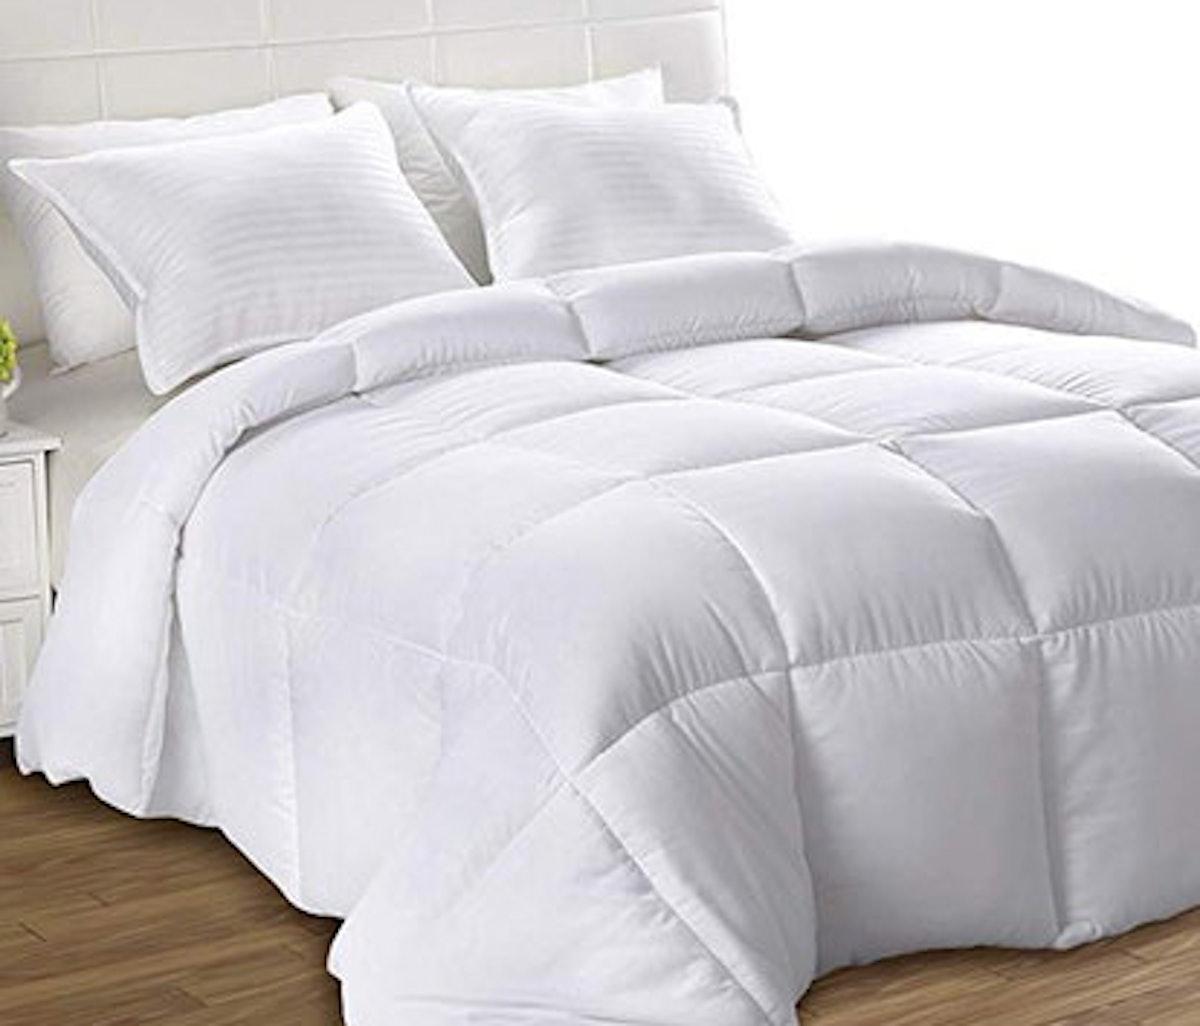 Utopia Bedding All Season Comforter